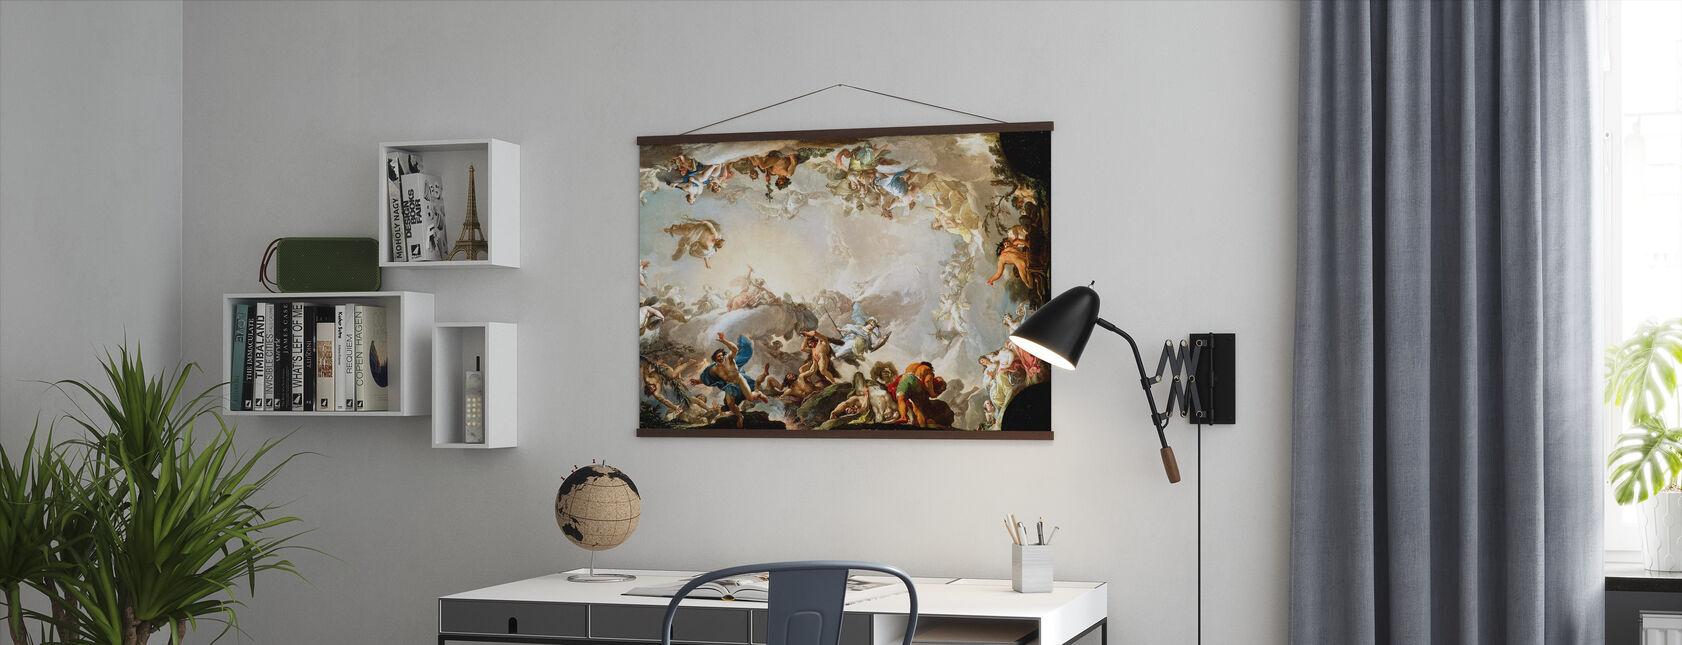 Renaissance-cirkel - Poster - Kantoor